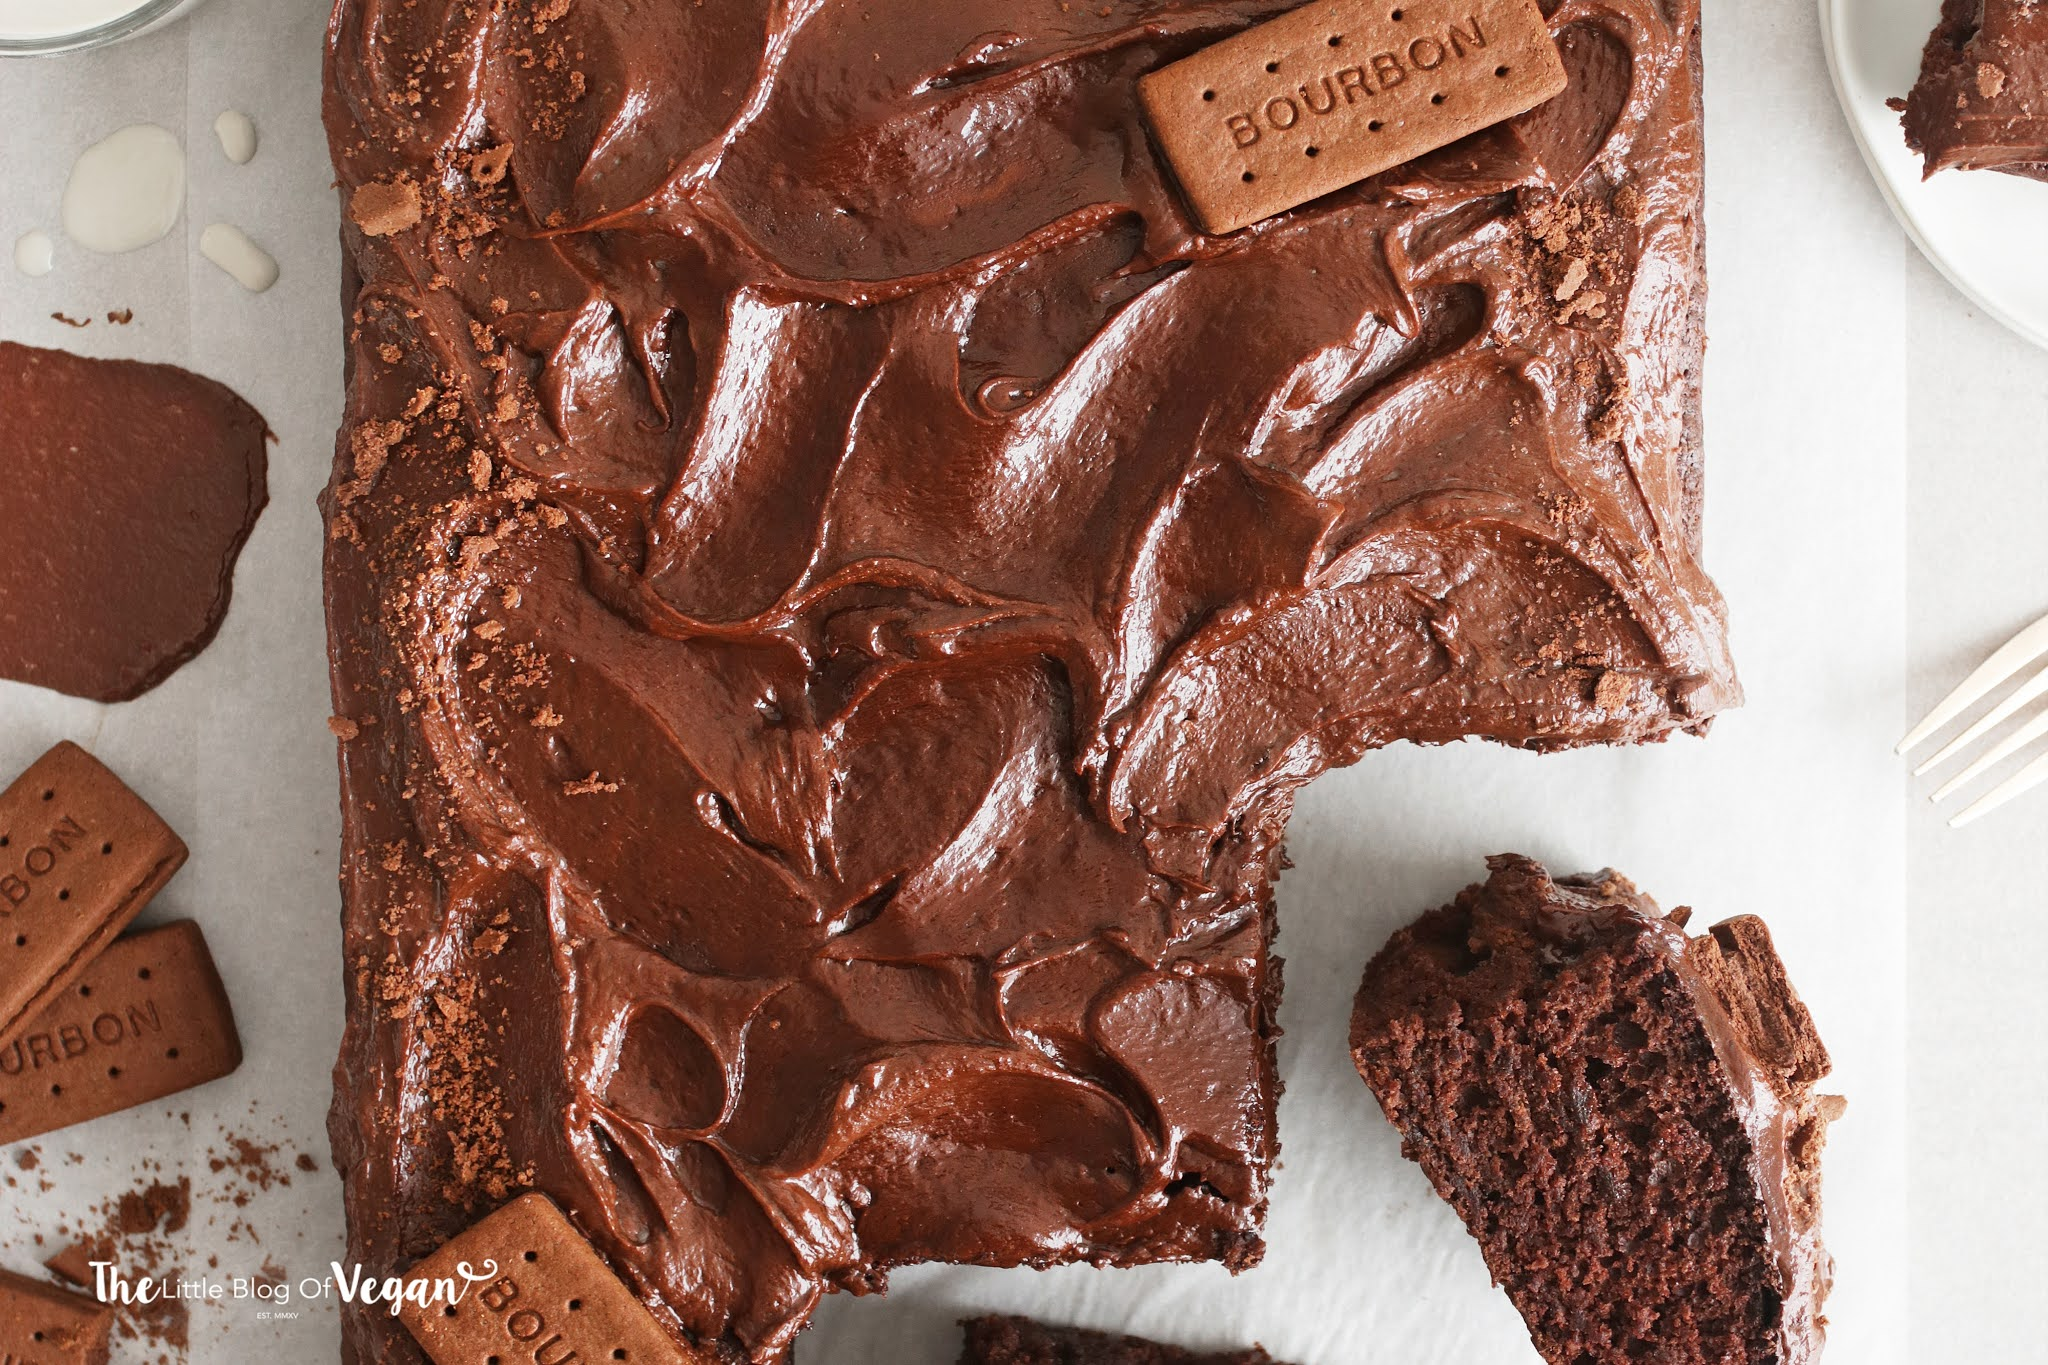 Vegan Bourbon Sheet Cake recipe